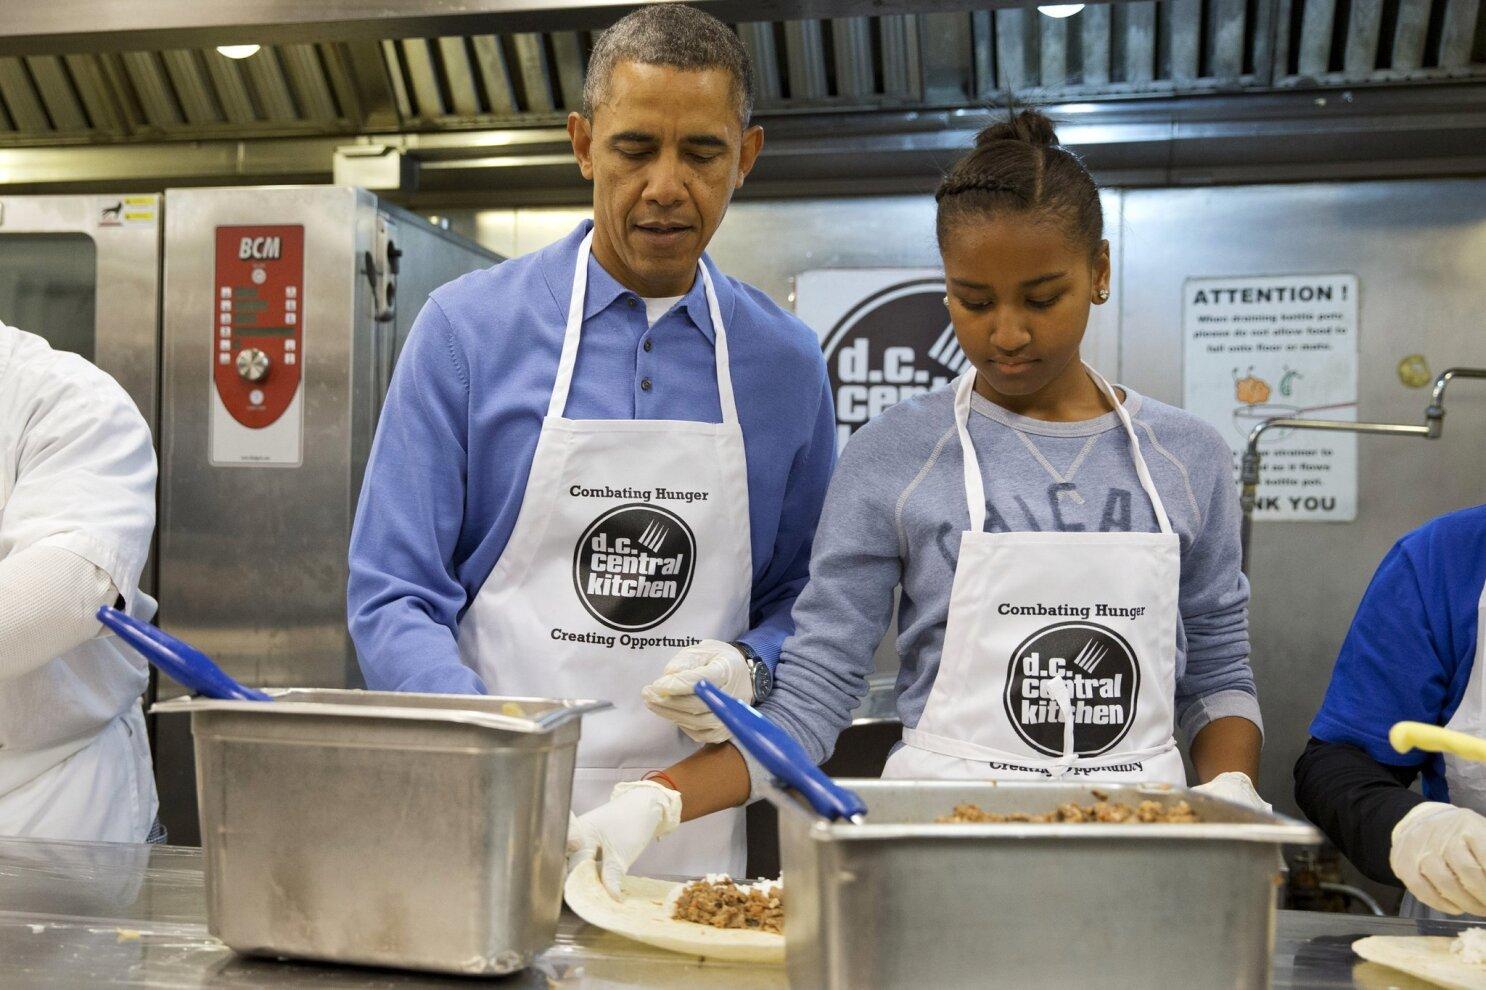 Obama Celebrates Mlk Holiday Visits Soup Kitchen The San Diego Union Tribune